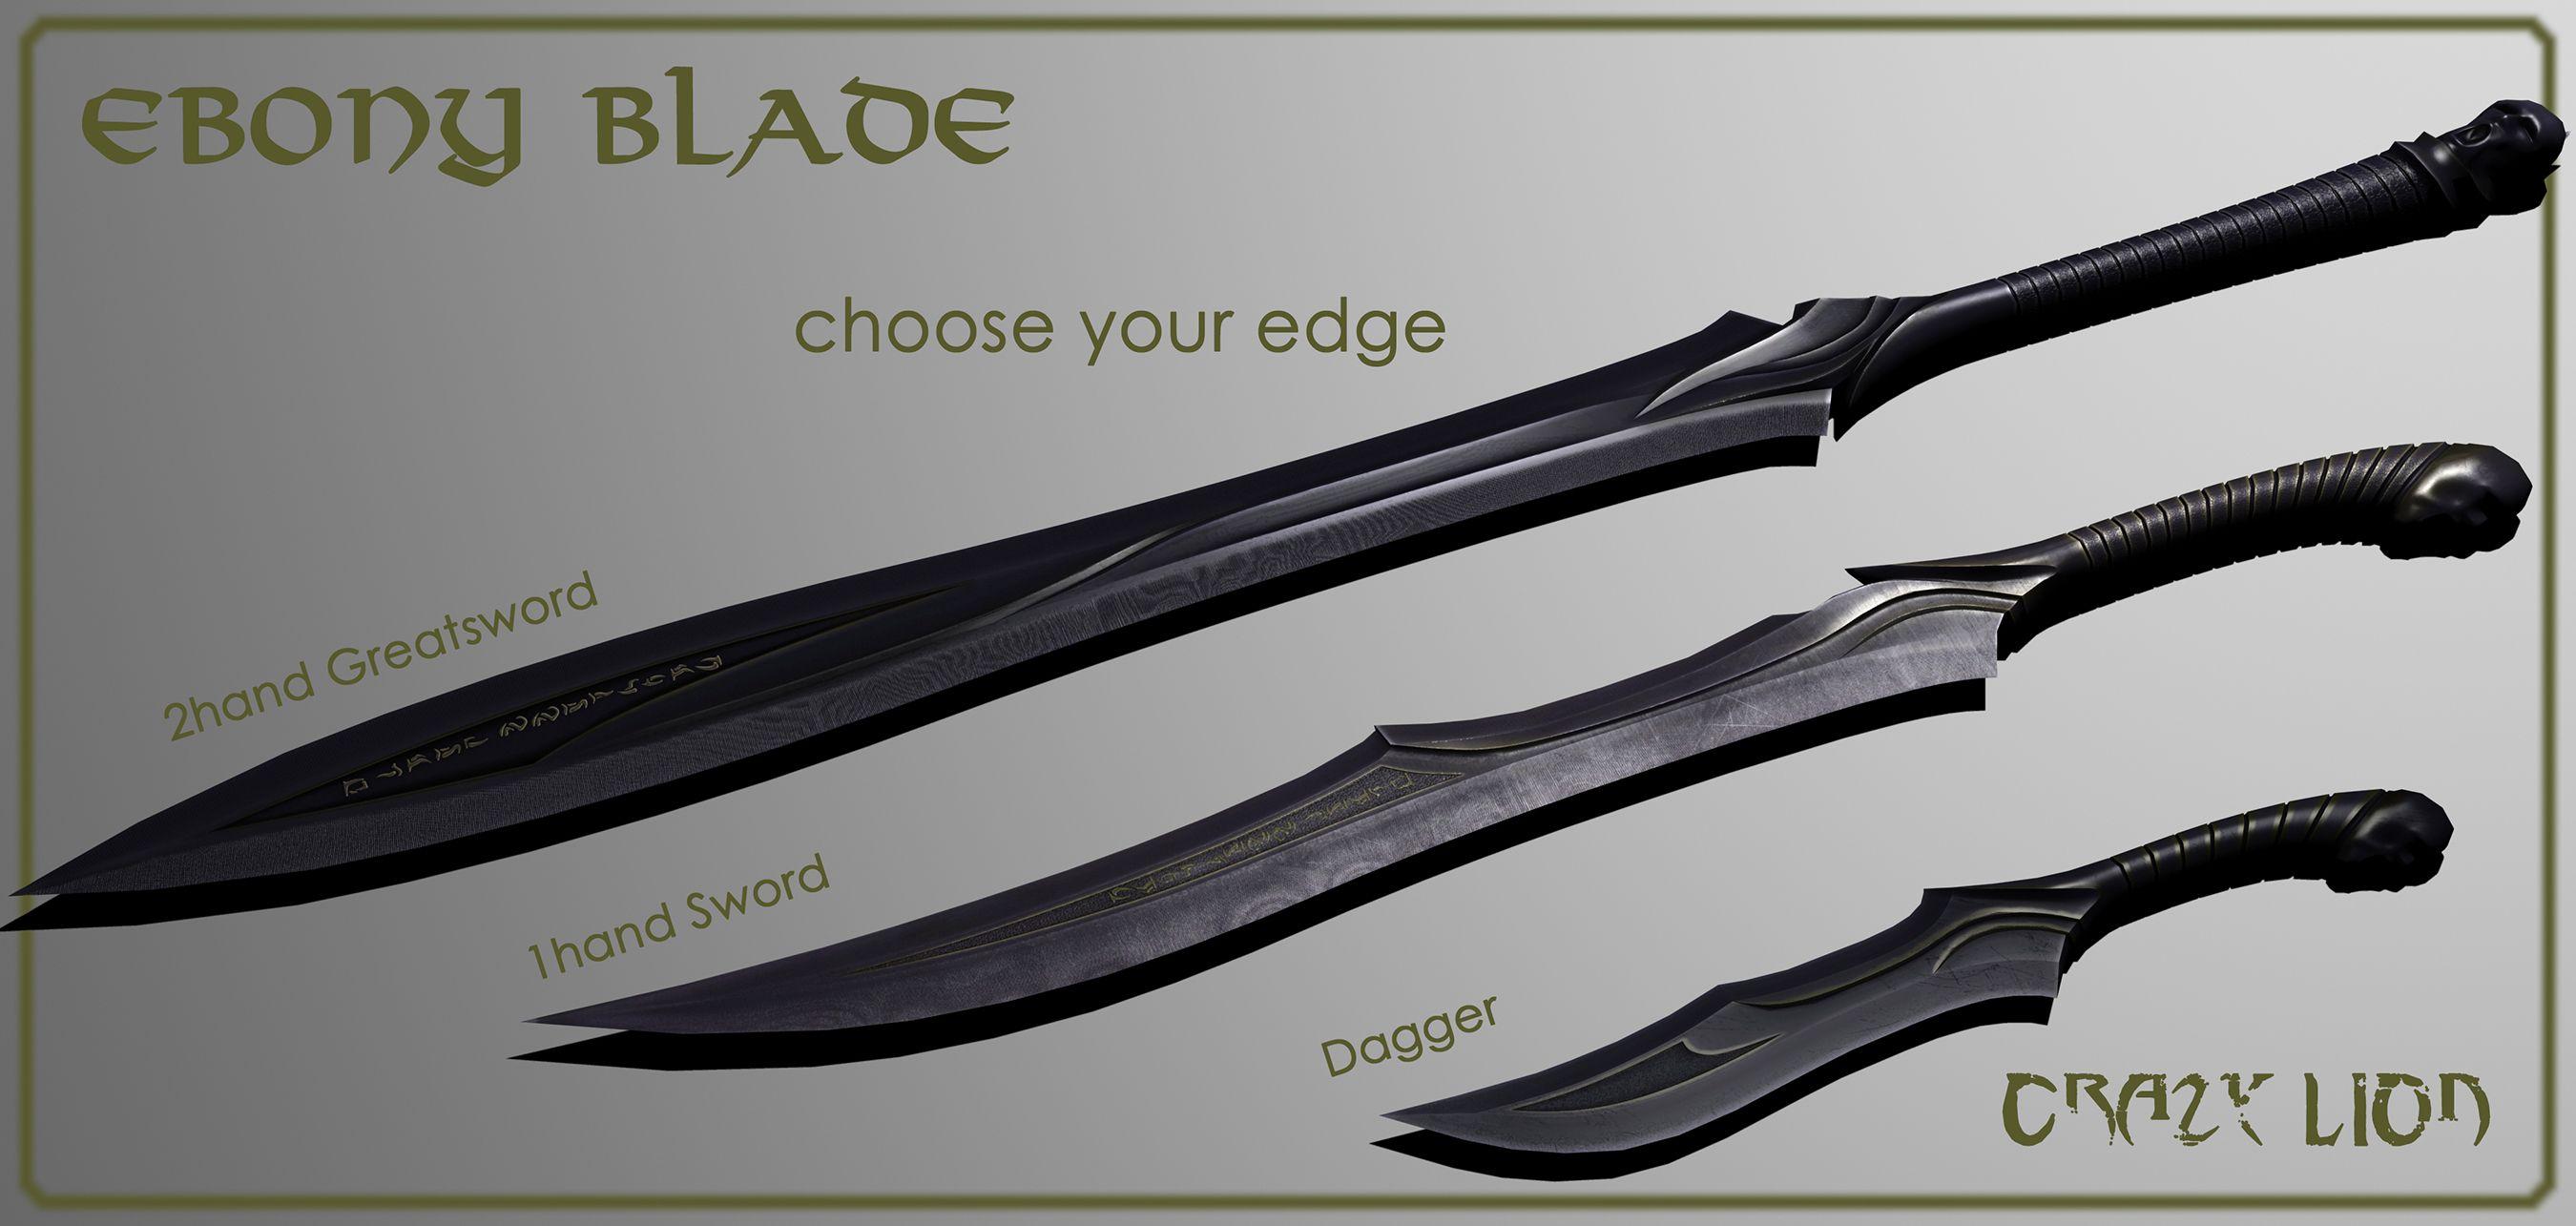 Skyrim the ebony blade